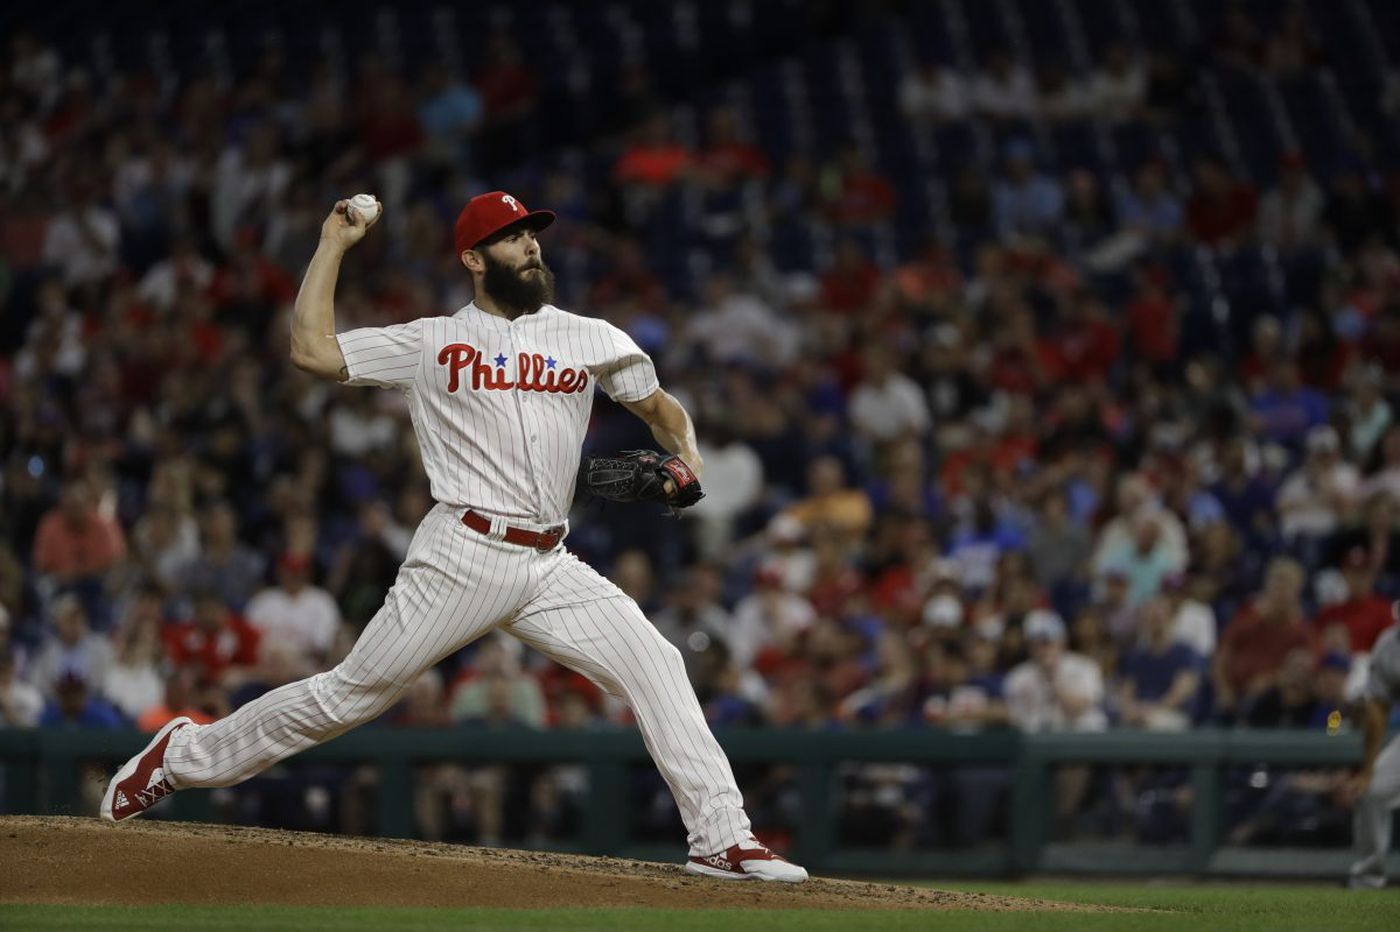 Phillies' Jake Arrieta chased by Cardinals in loss, but Odubel Herrera's streak is alive